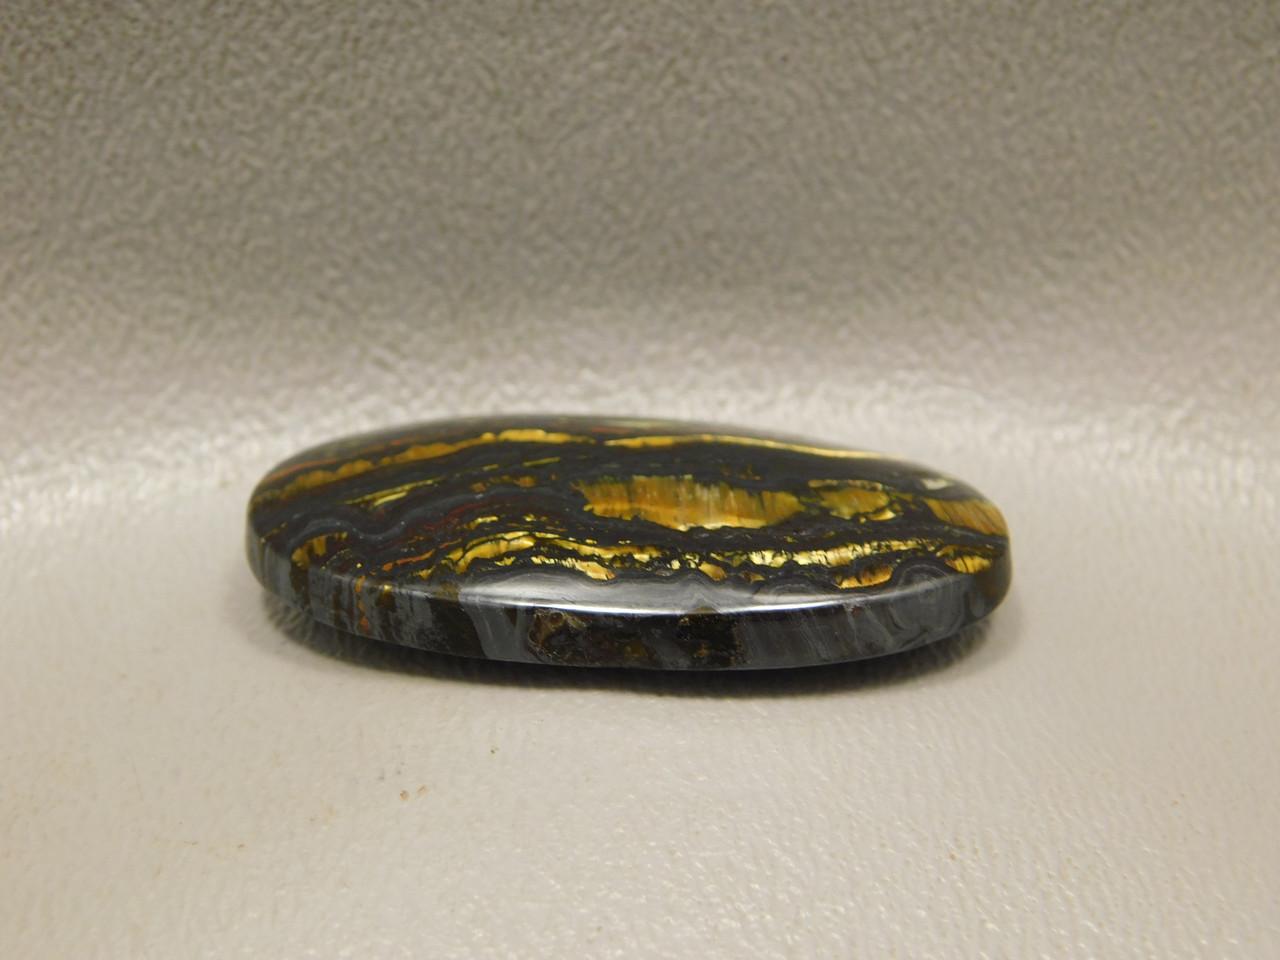 Tiger Iron Golden Chatoyant Stone Cabochon #6